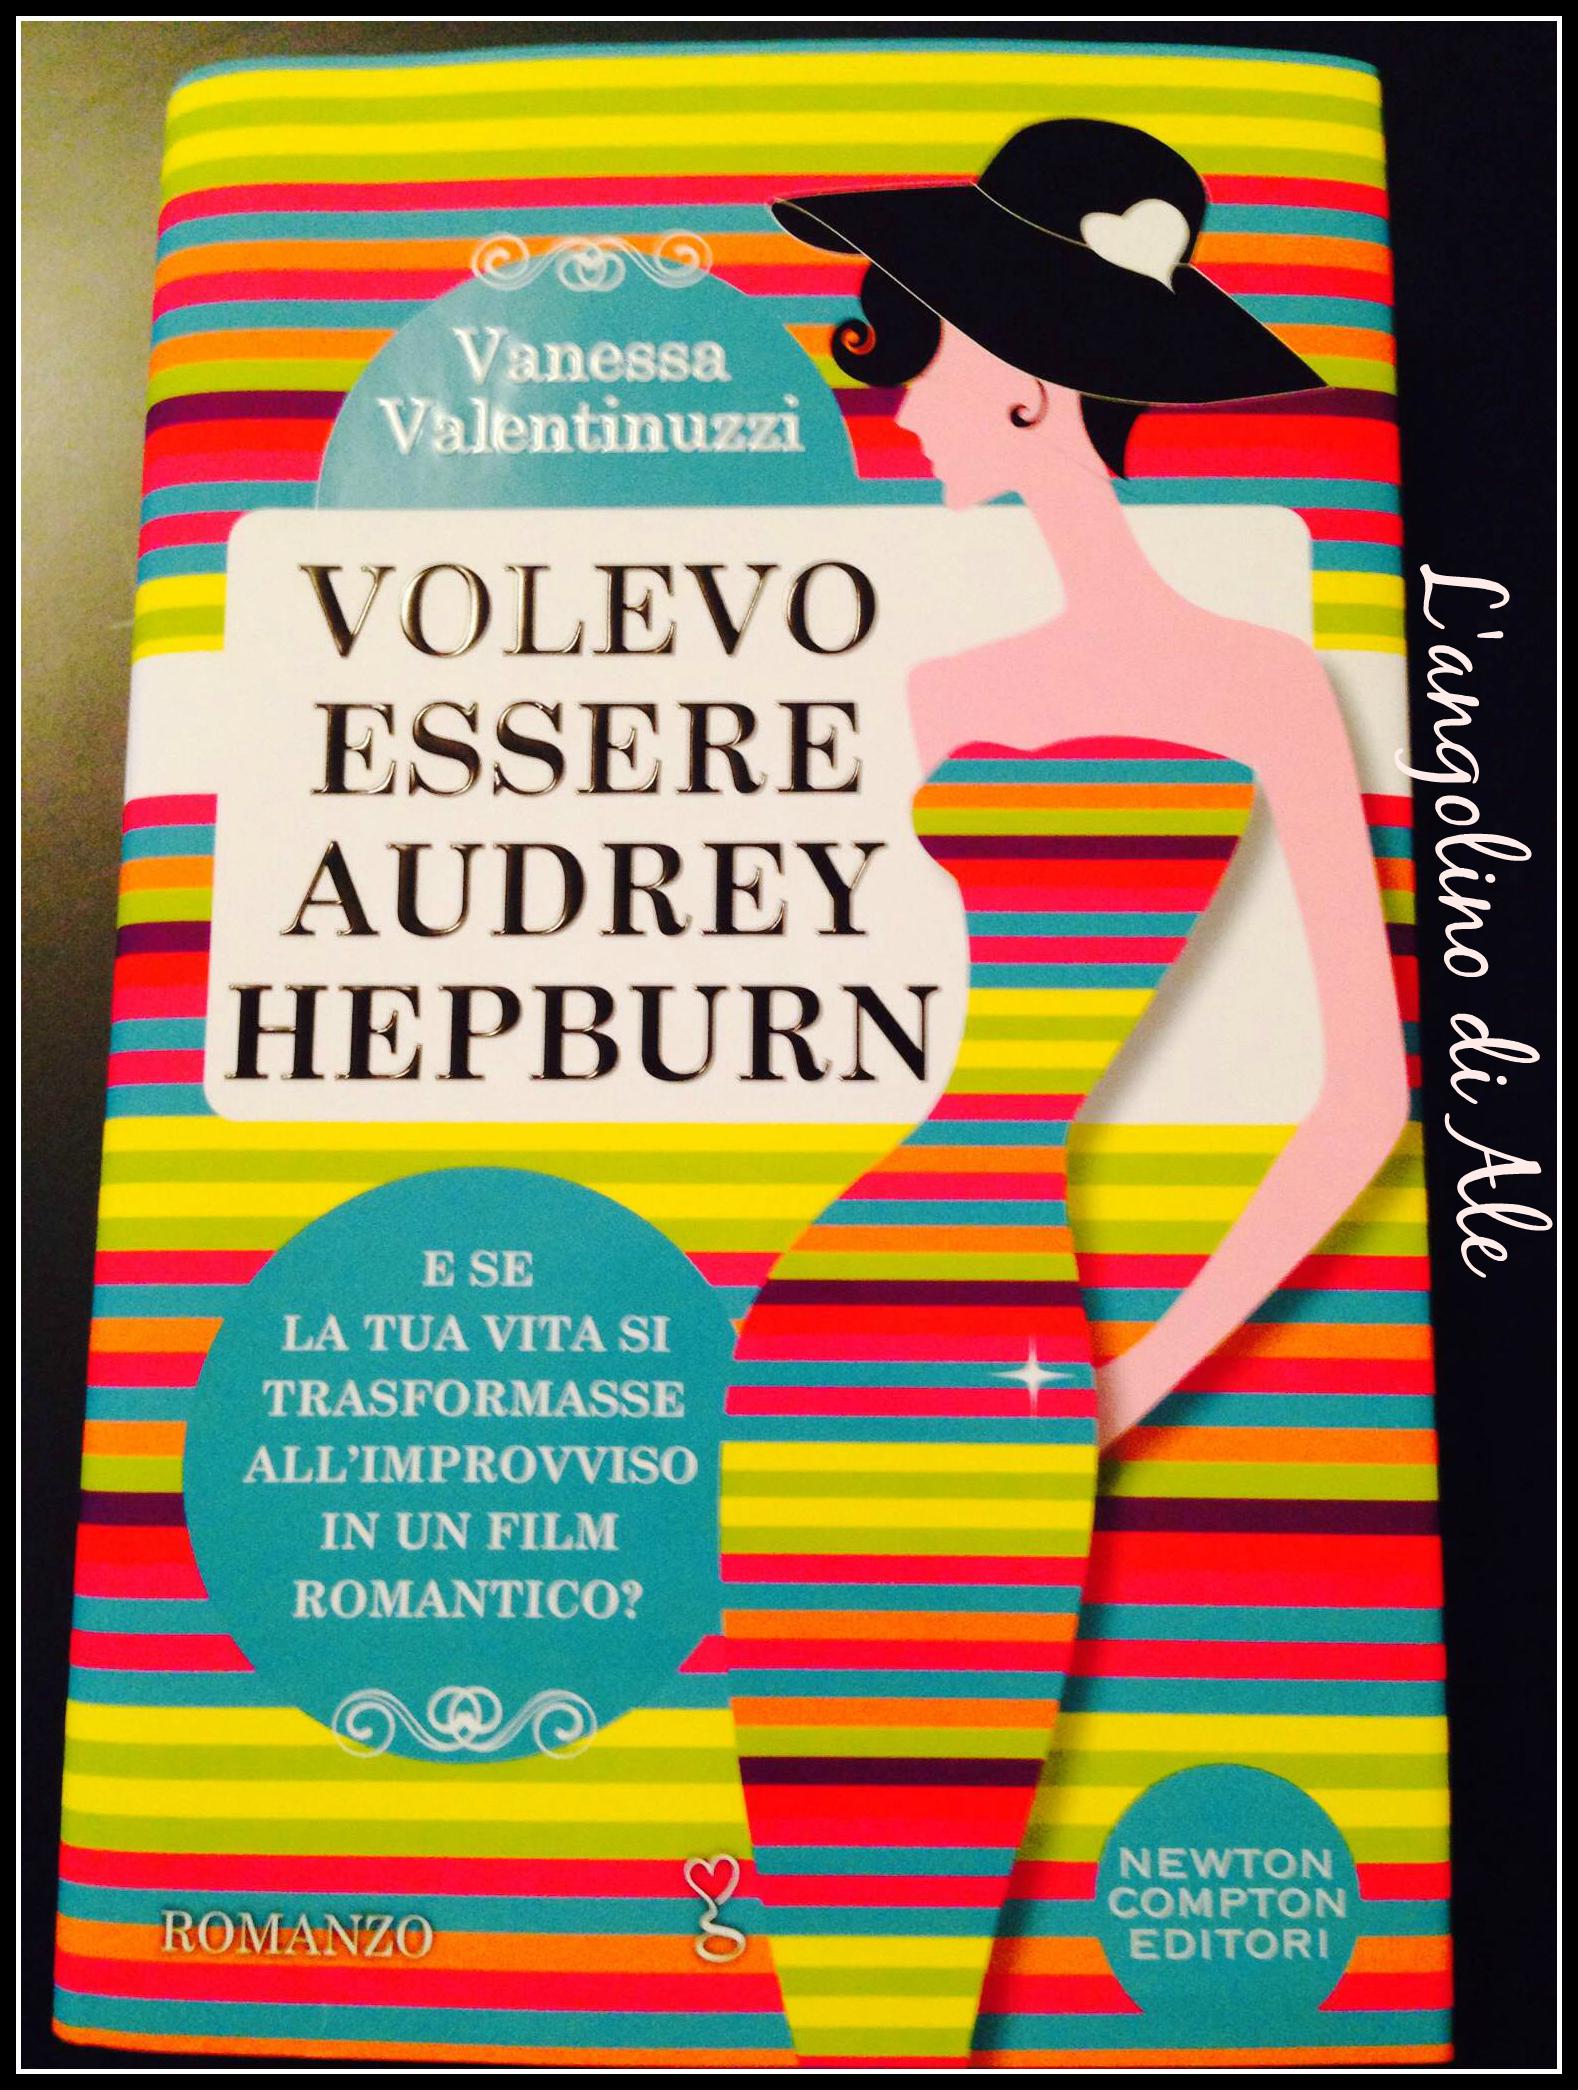 Volevo essere Audrey Hepburn di Vanessa Valentinuzzi